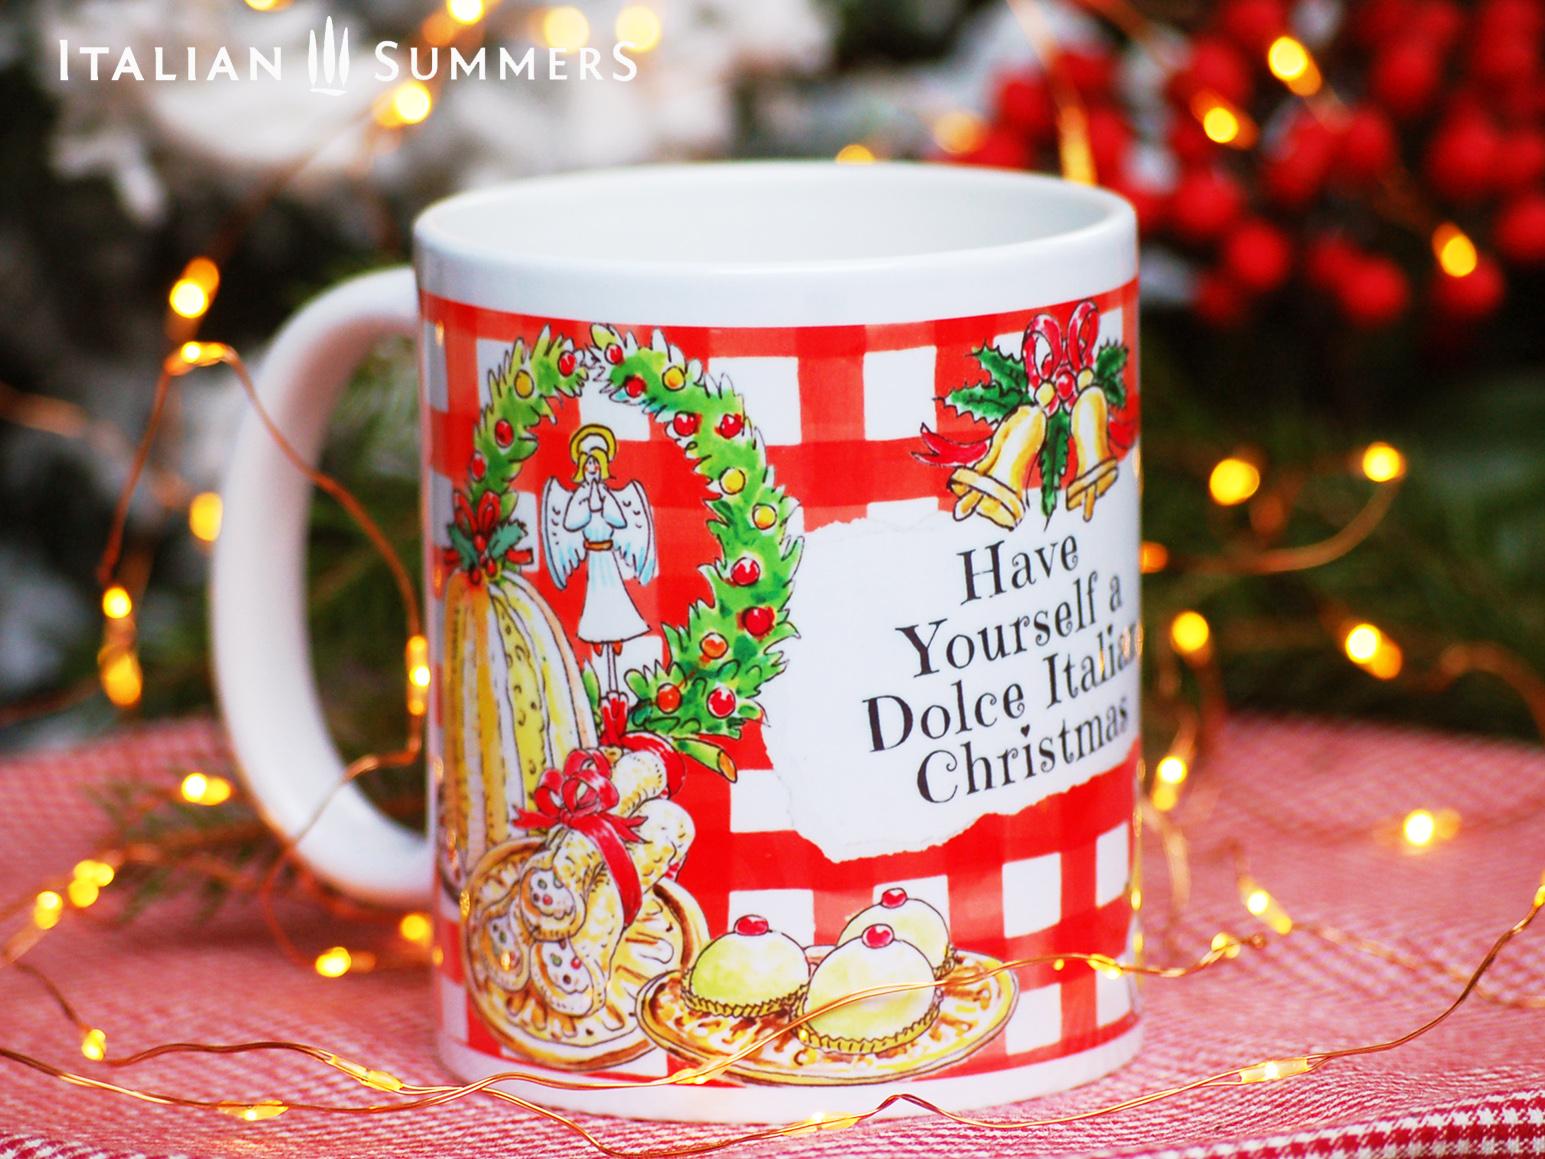 Italian Christmas mug PANE E DOLCI by Italian Summers